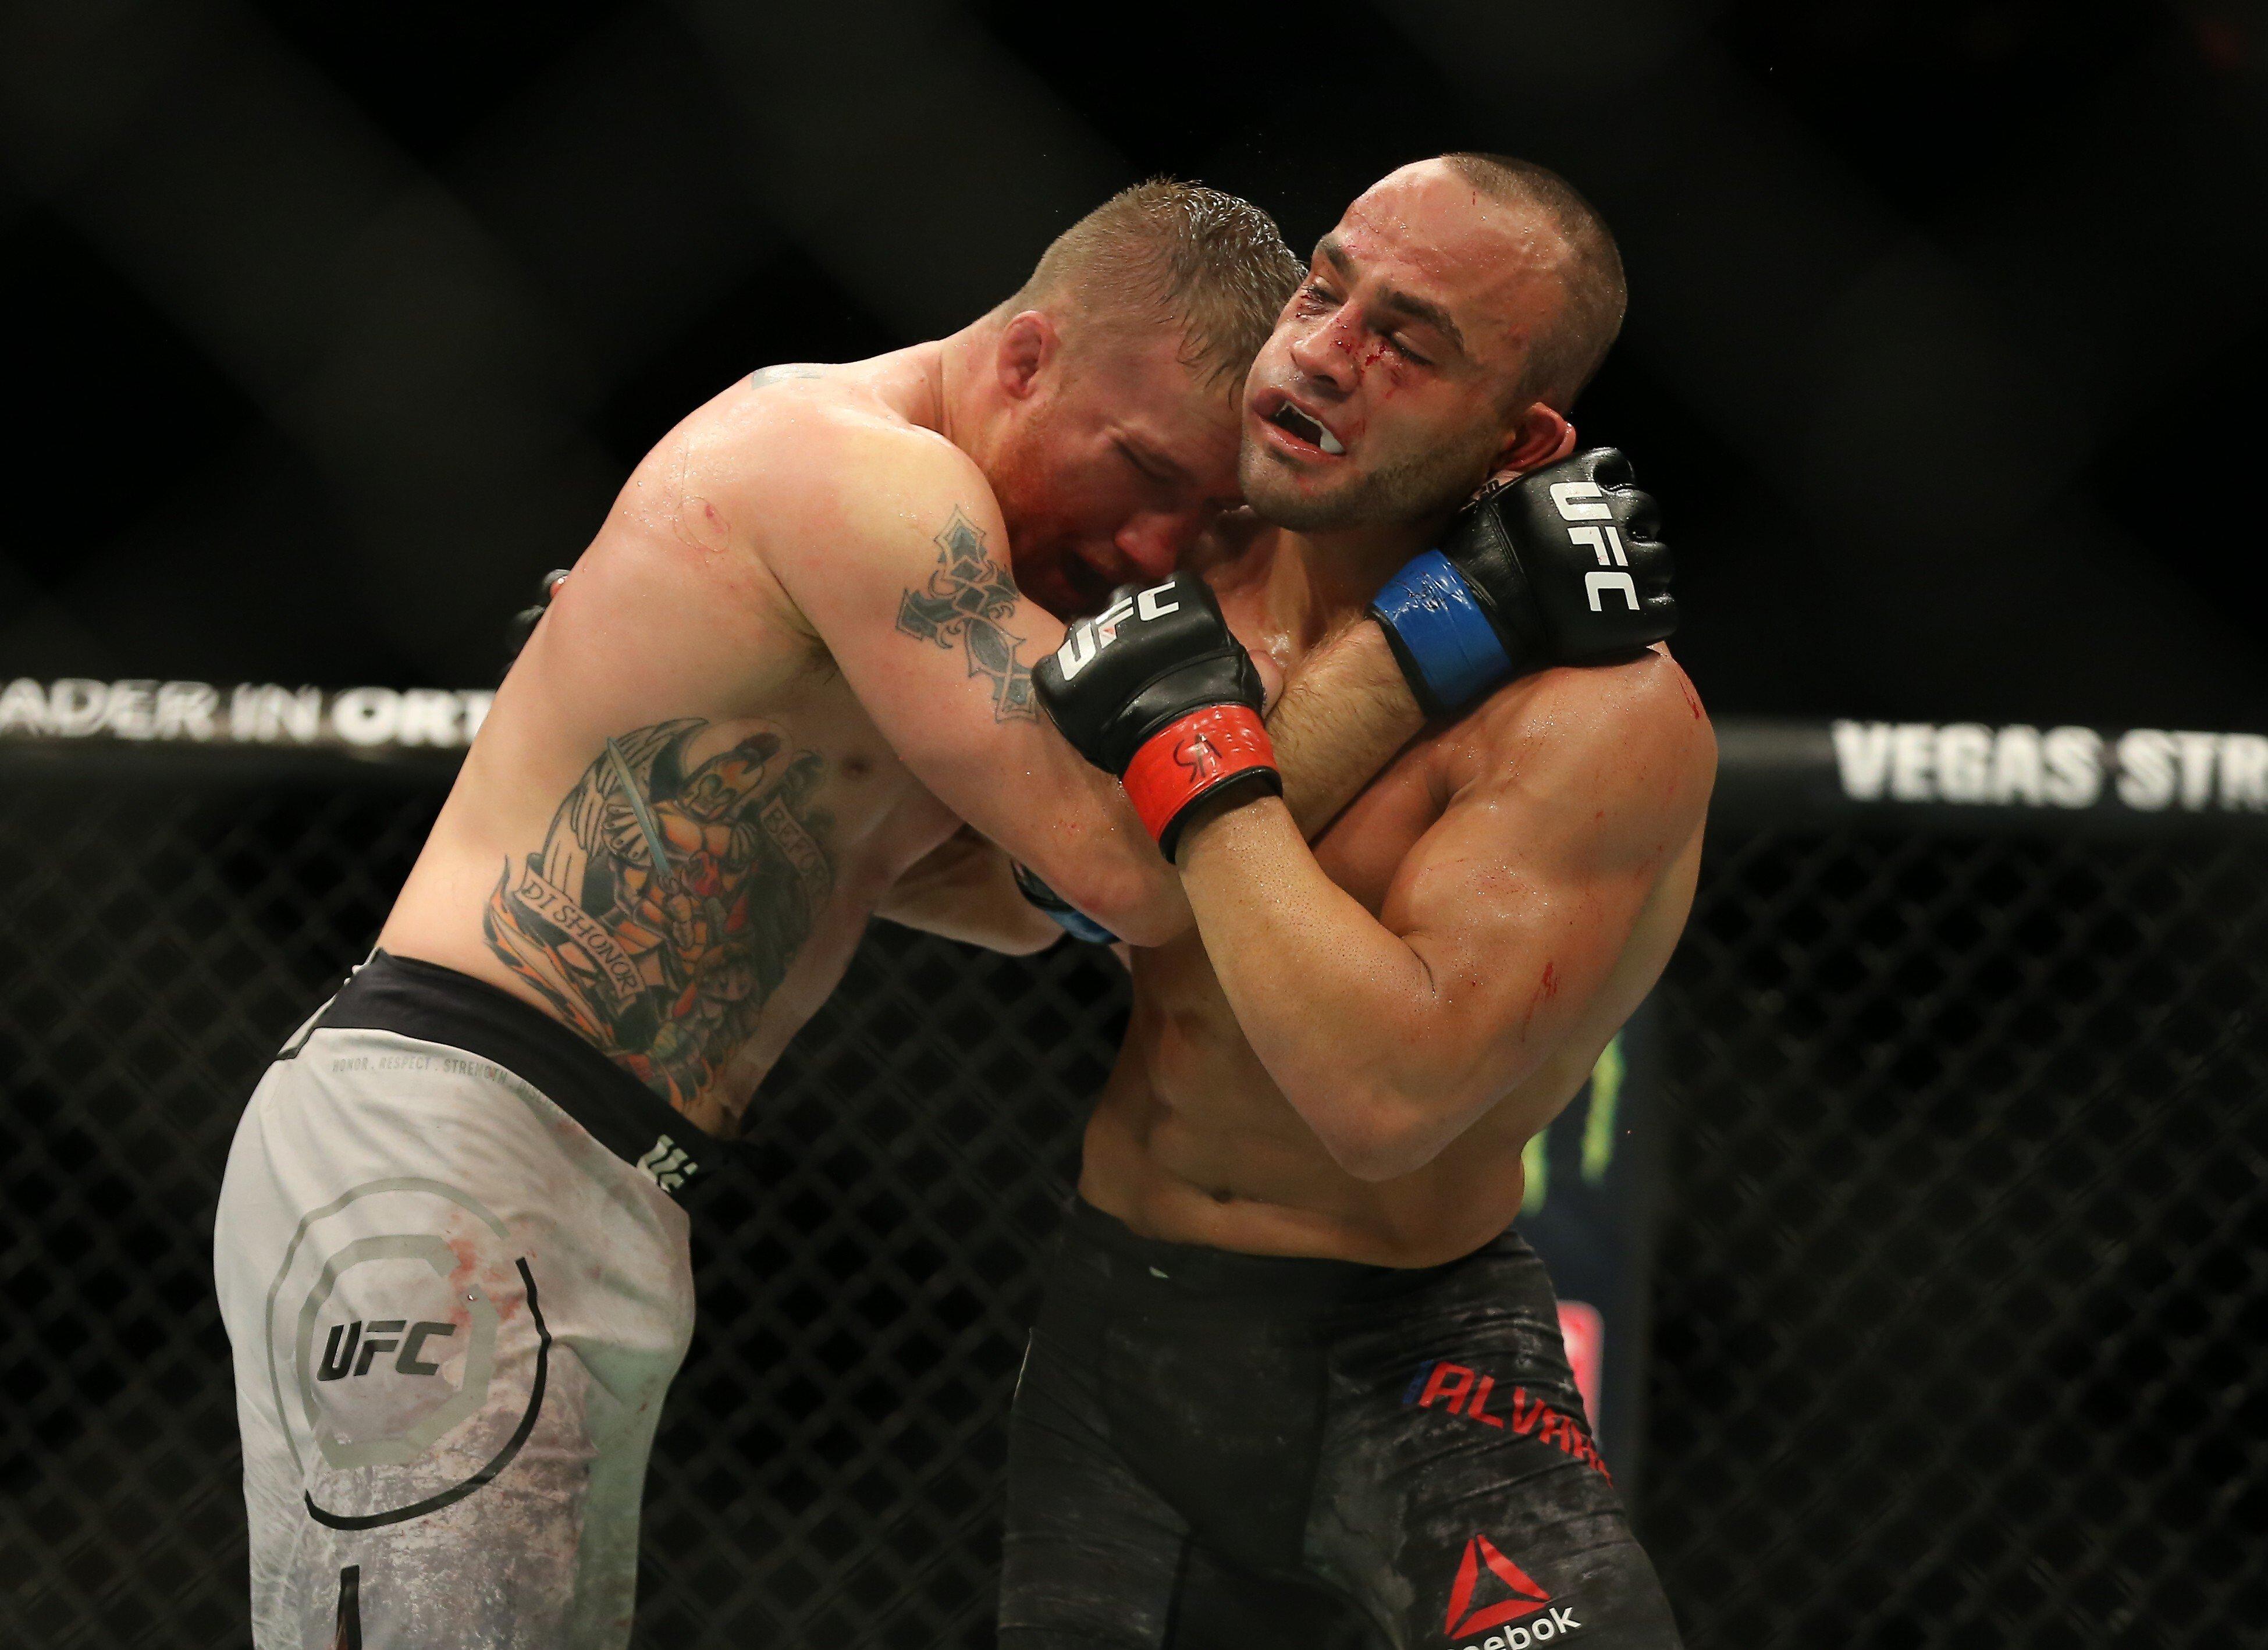 UFC: Eddie Alvarez hopes 'incredible' Justin Gaethje beats Khabib – 'I like watching him more than anyone' | South China Morning Post